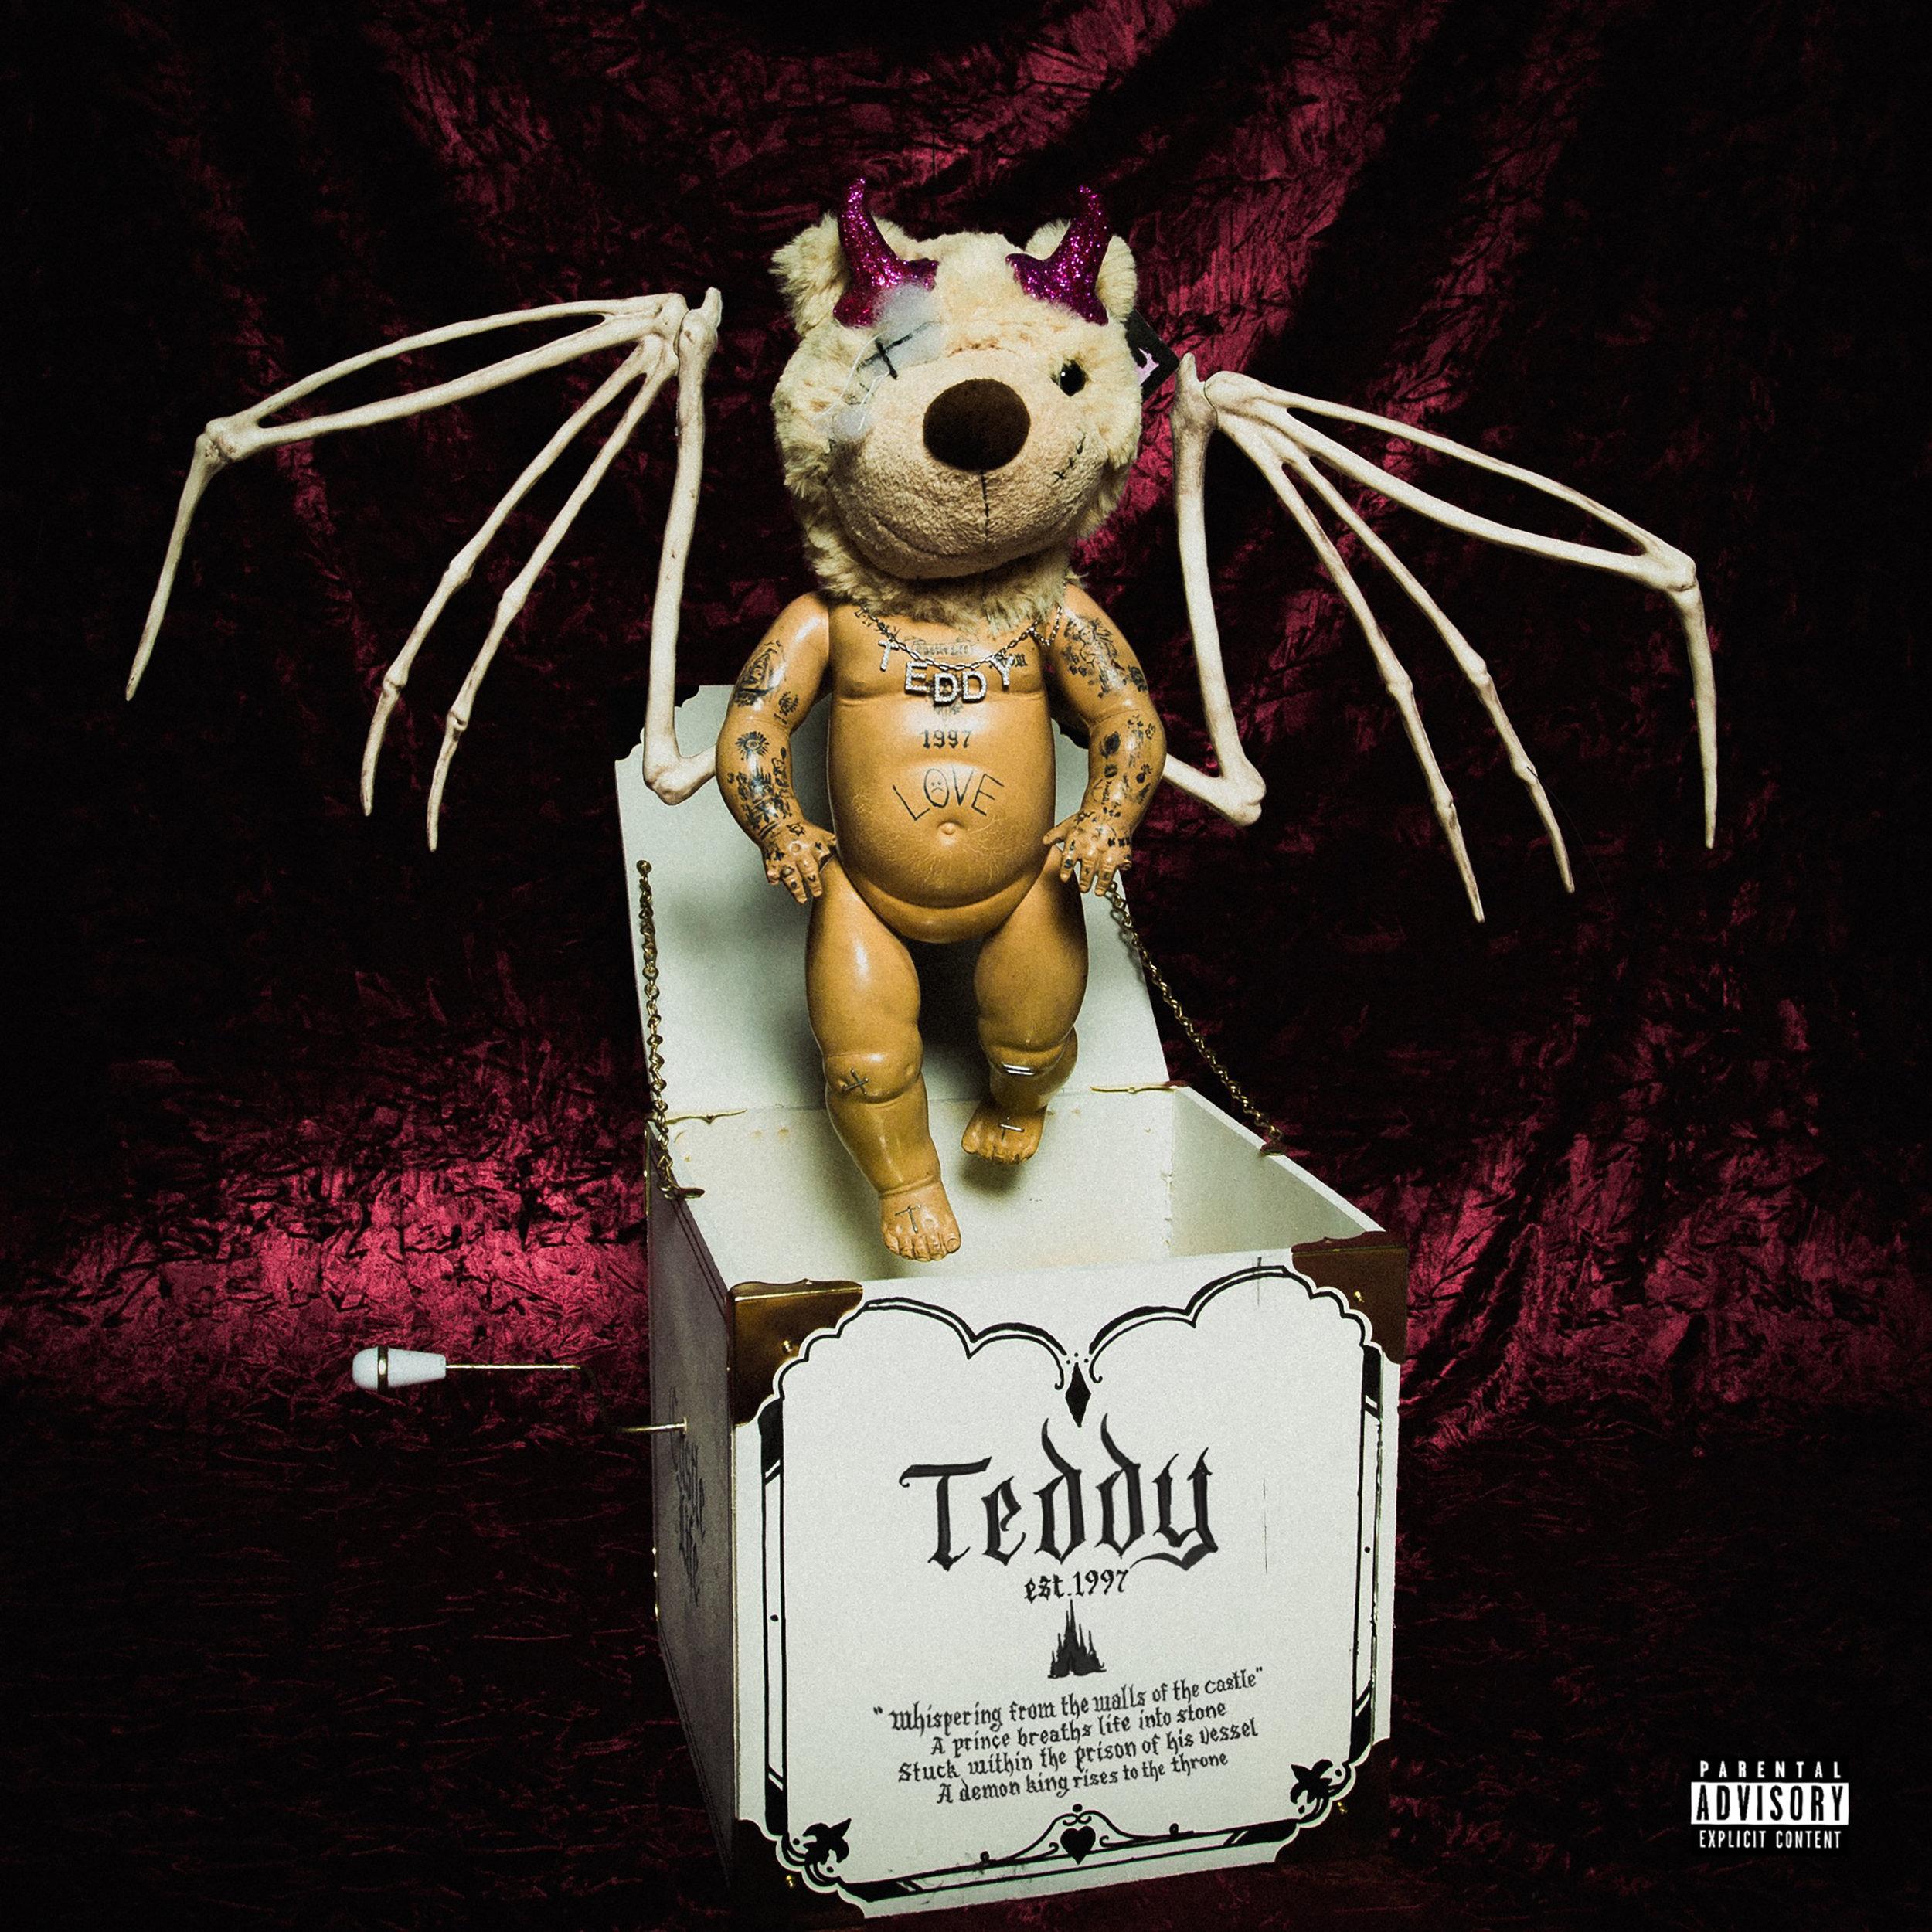 Teddy - Album Cover.JPG